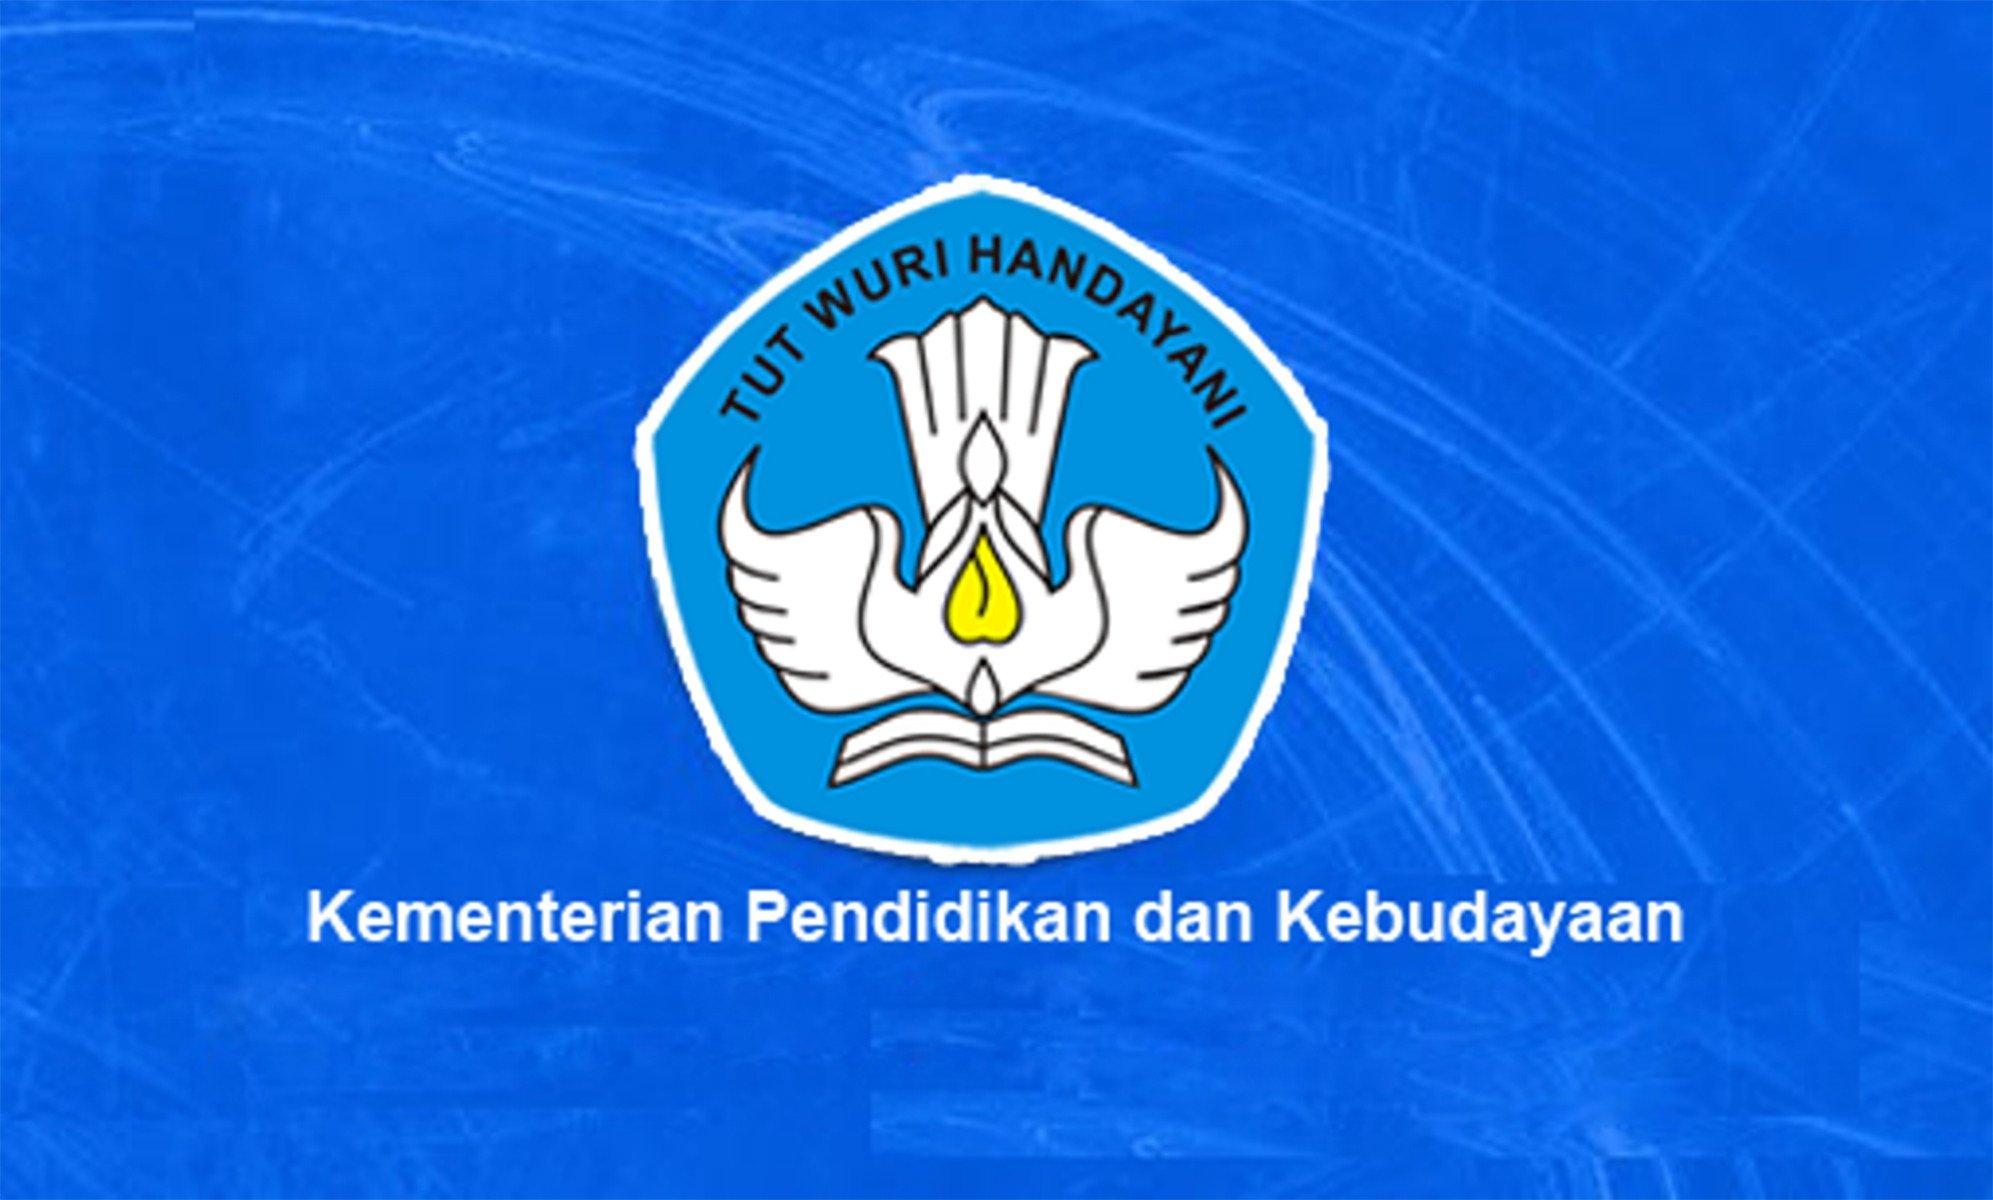 Kemendikbud Buka Lagi Lowongan Guru Penggerak, Buruan Daftar, Kuotanya Banyak - JPNN.com